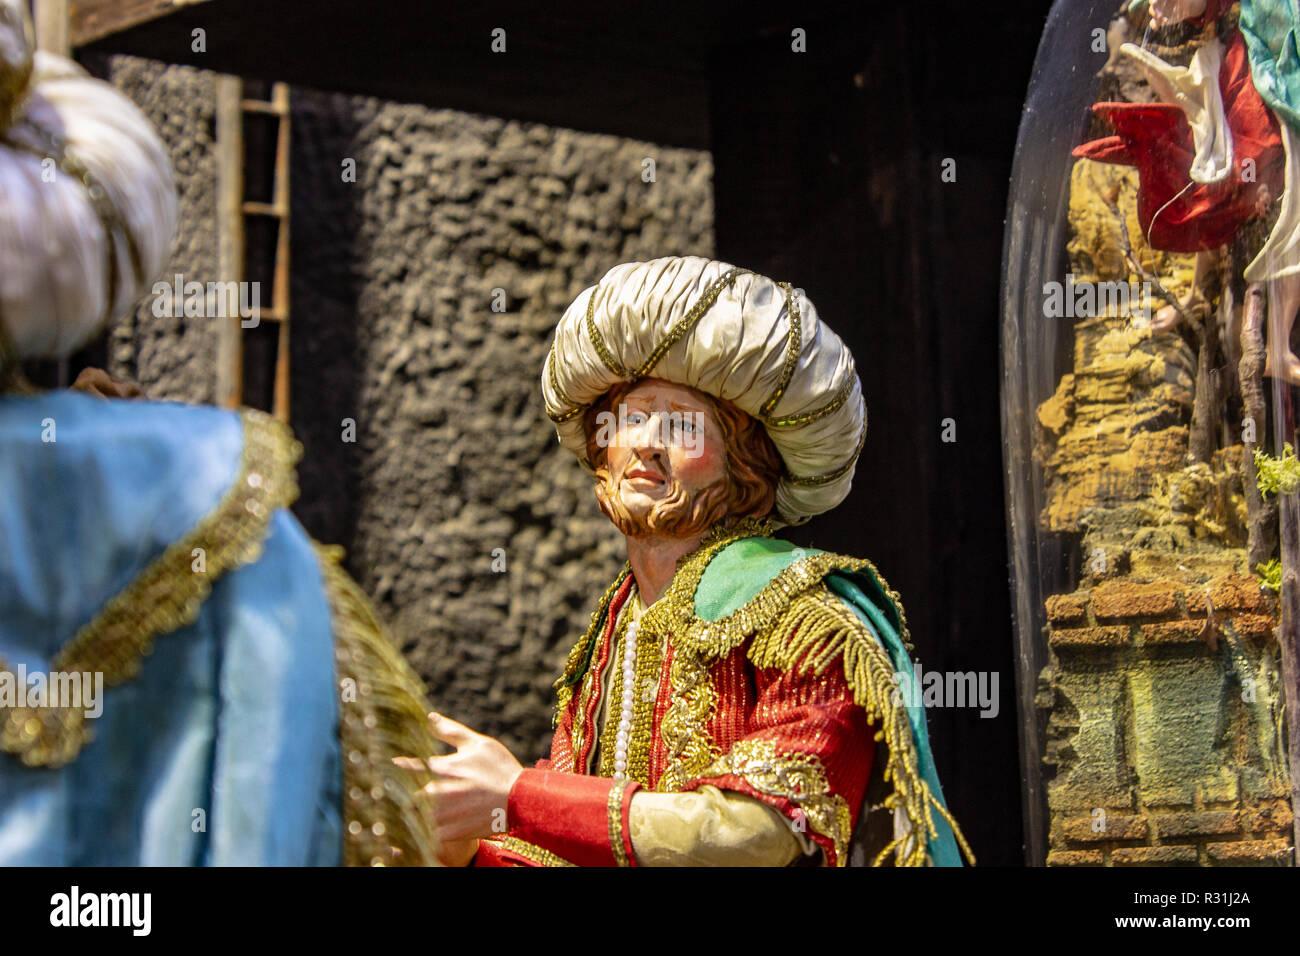 Naples, San Gregorio Armeno , a typical presage of napolitan nativity scene. 03/11/2018 - Stock Image